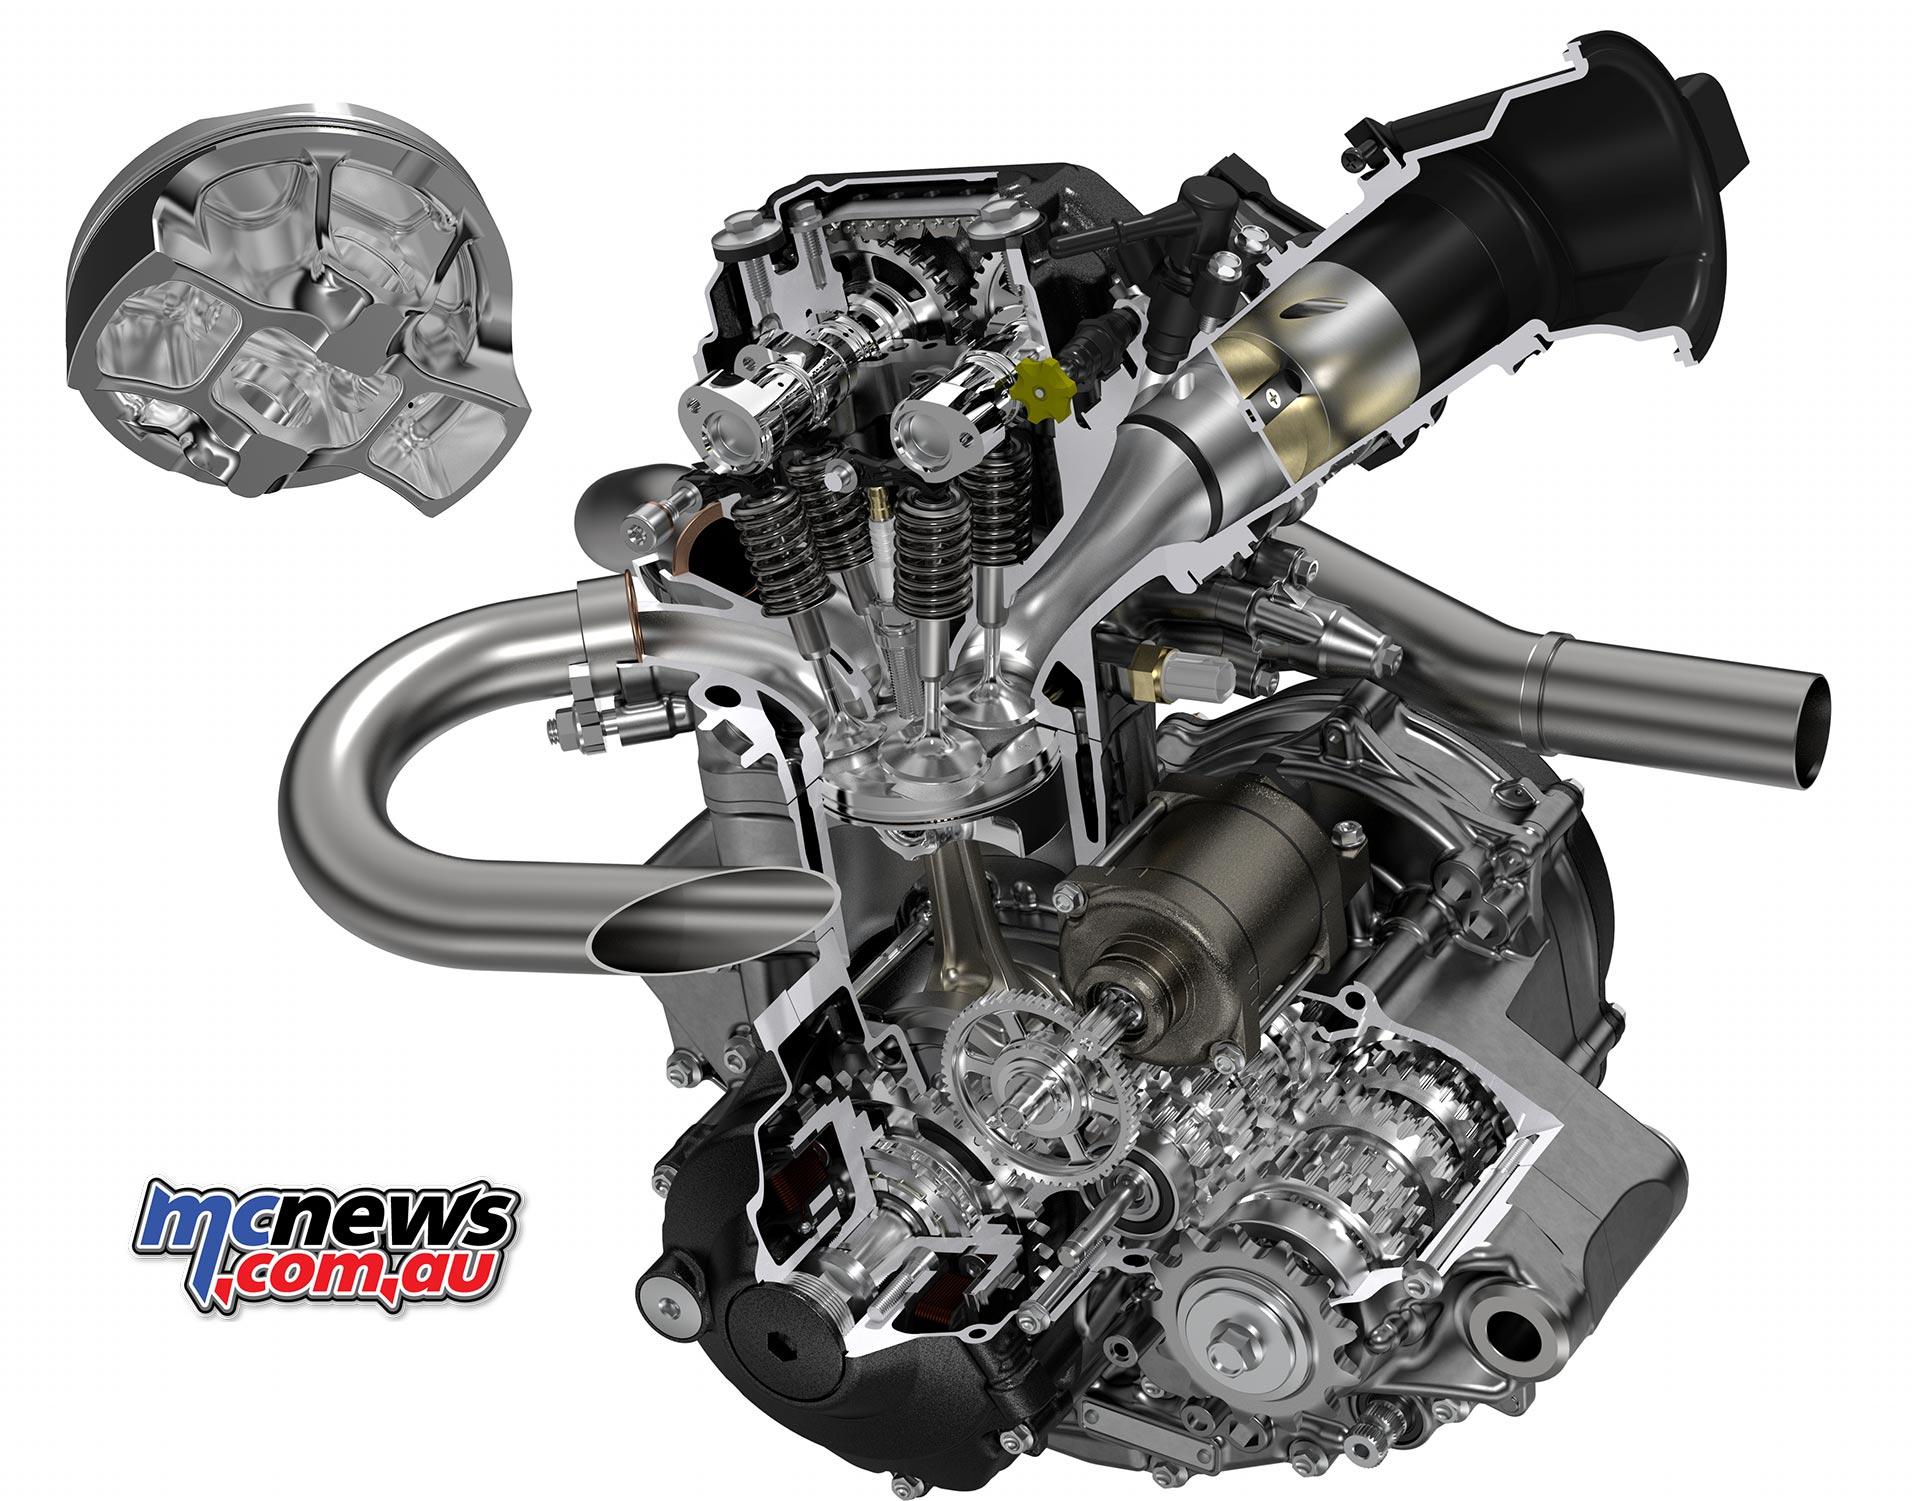 2018 CRF250R New DOHC engine | CRF450R Chassis | MCNews.com.au